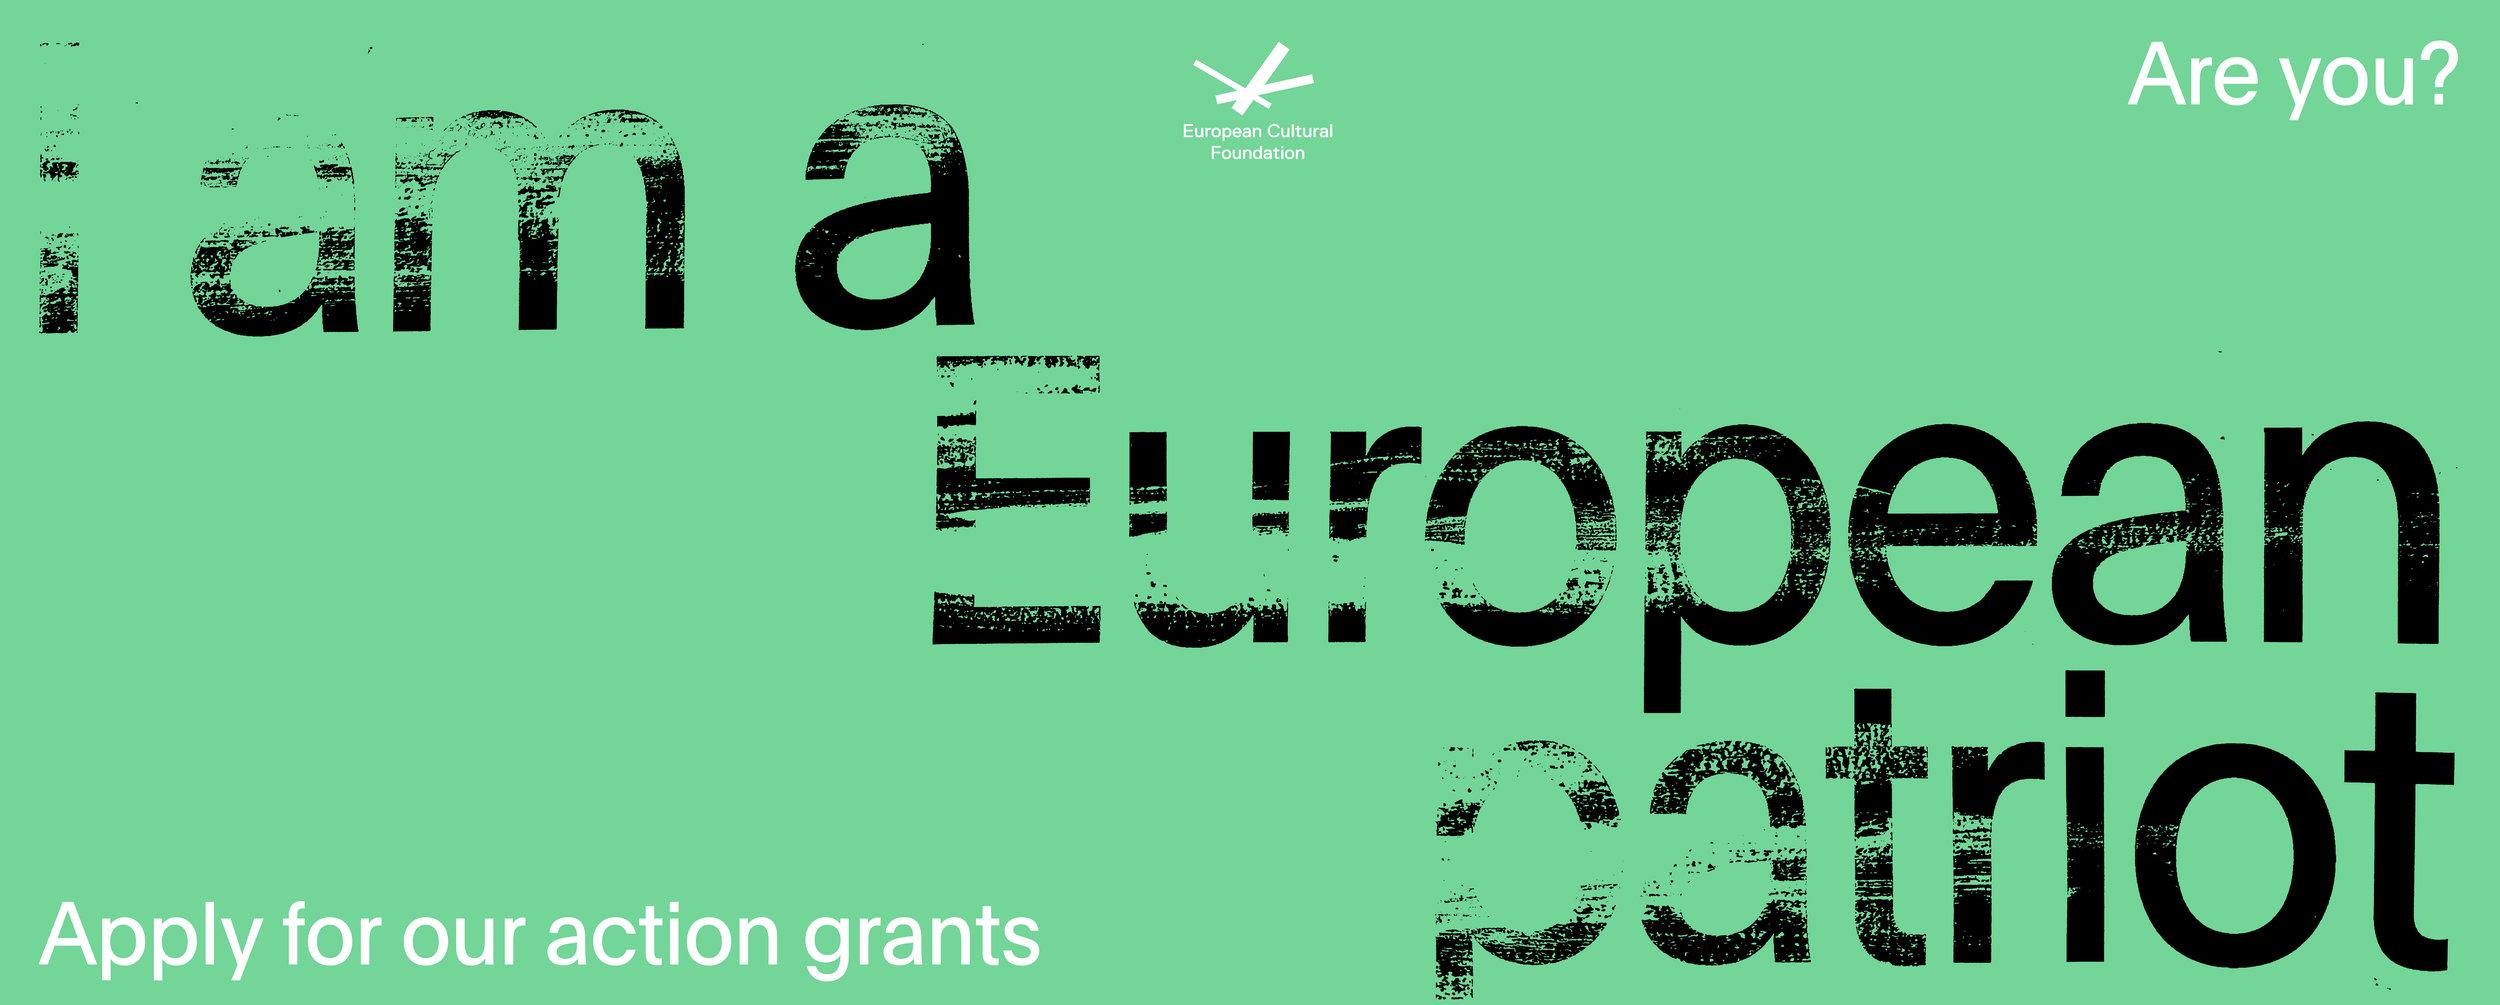 ARTW_European Cultural Foundation_Site_Patriot_F.jpg